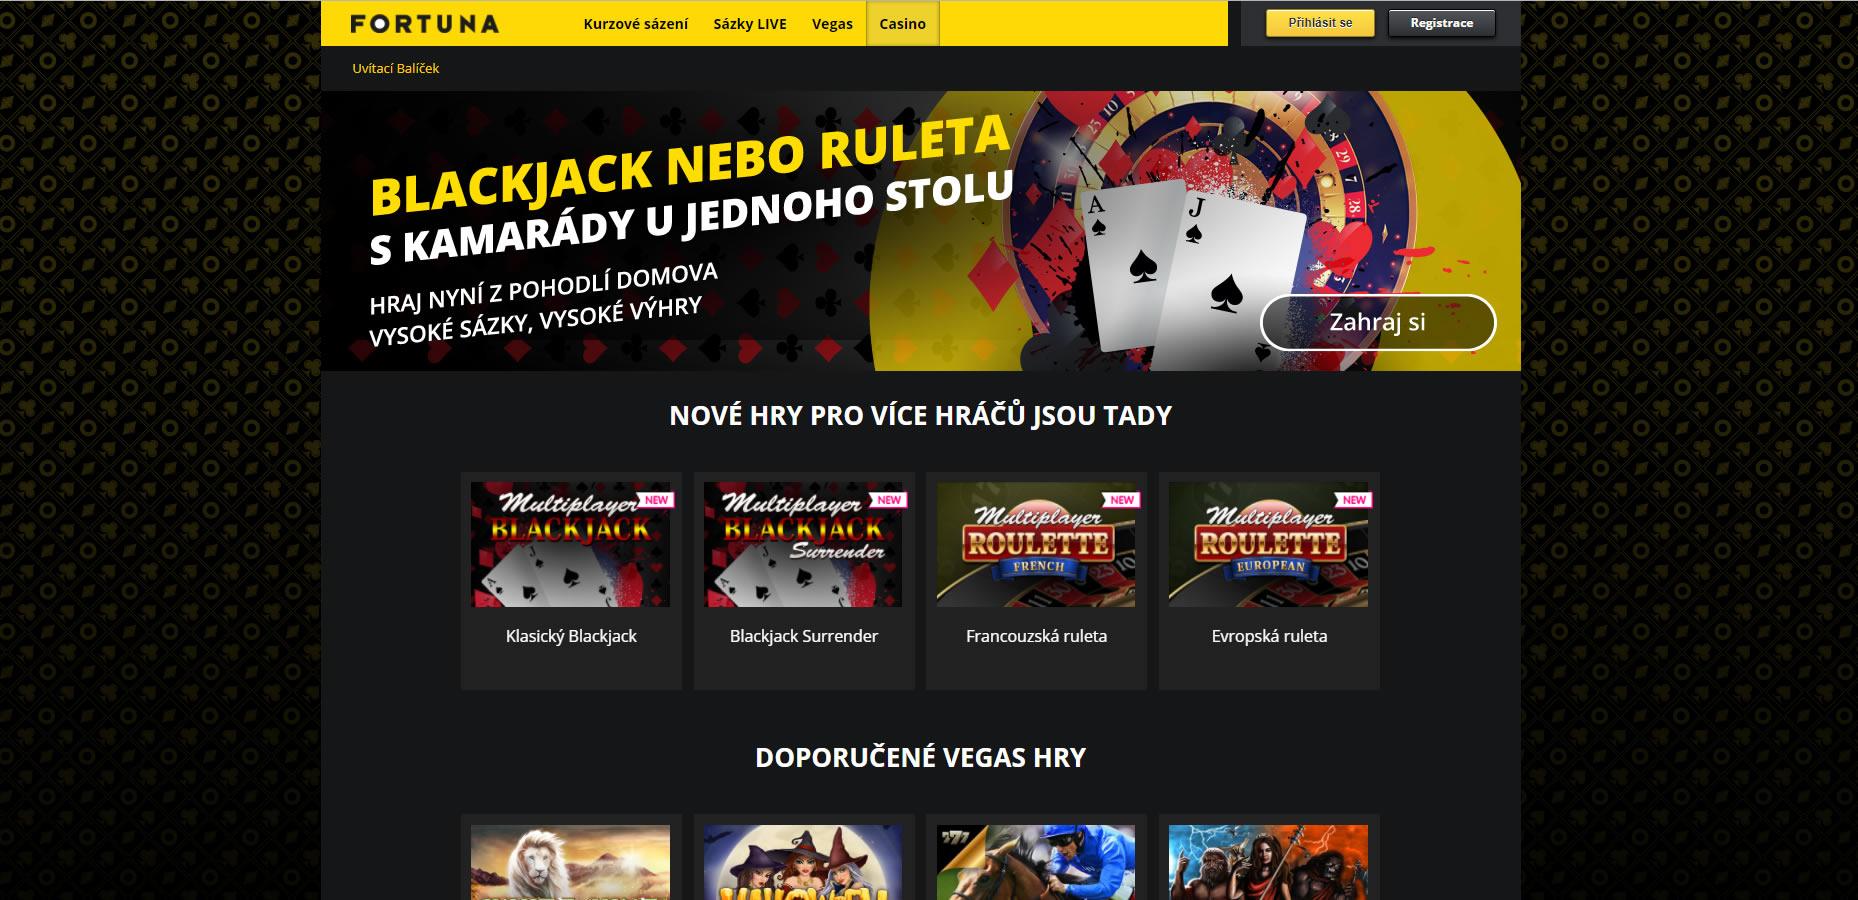 Casino Cz